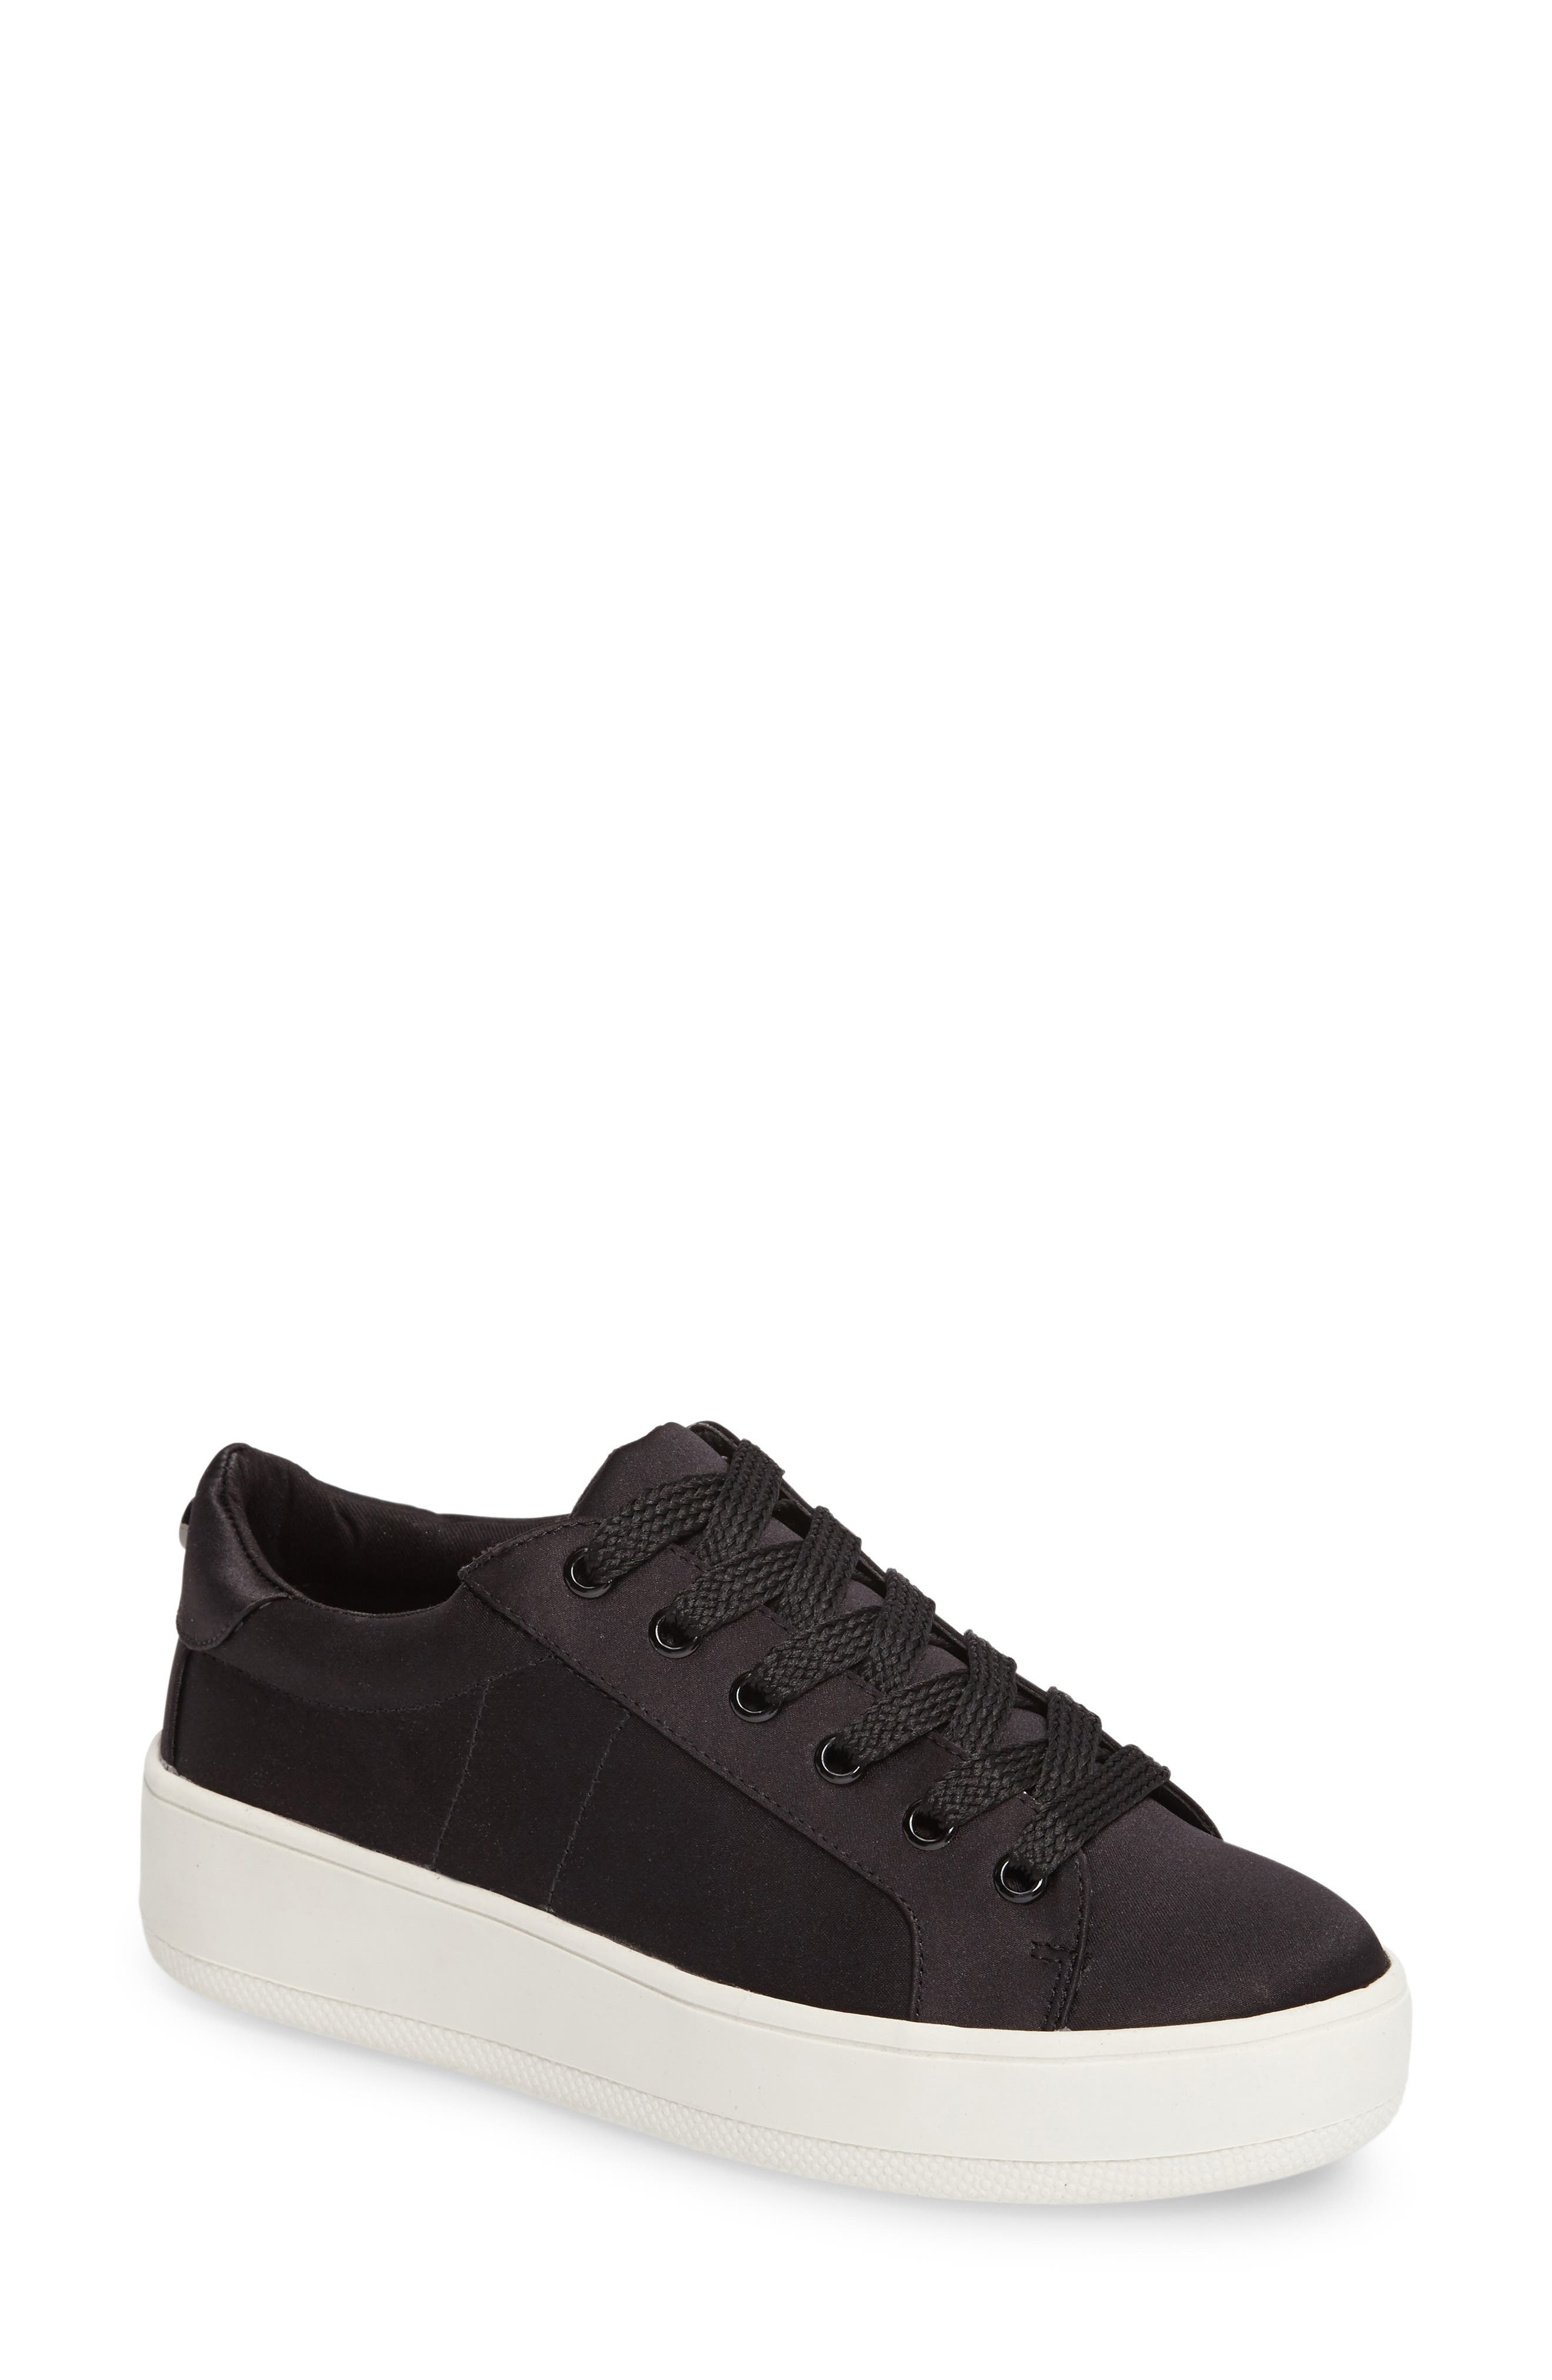 Main Image - Steve Madden Bertie-S Platform Sneaker (Women)